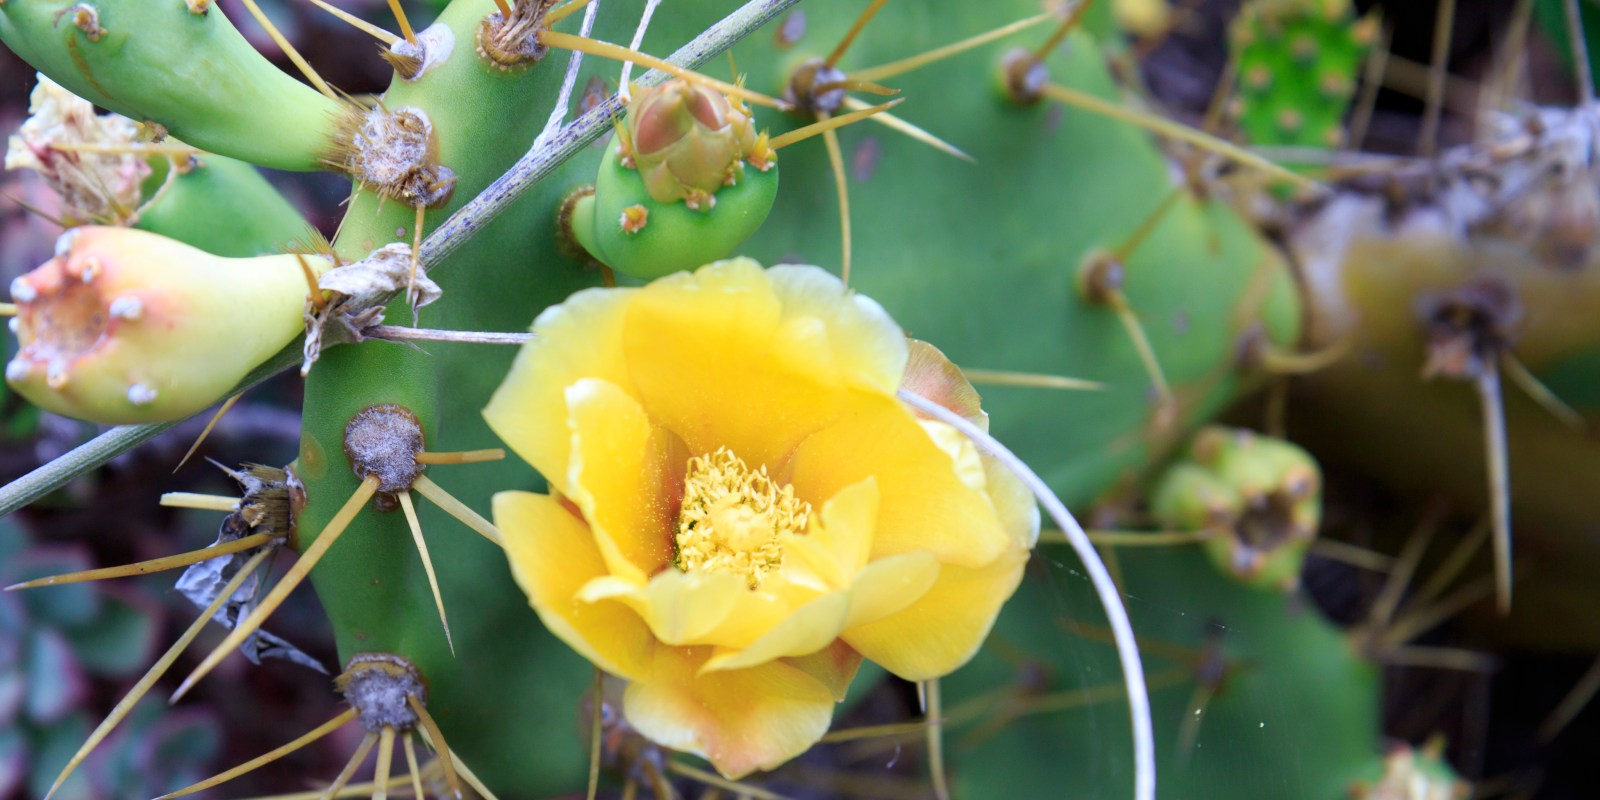 Una opuntia o chumbera en flor